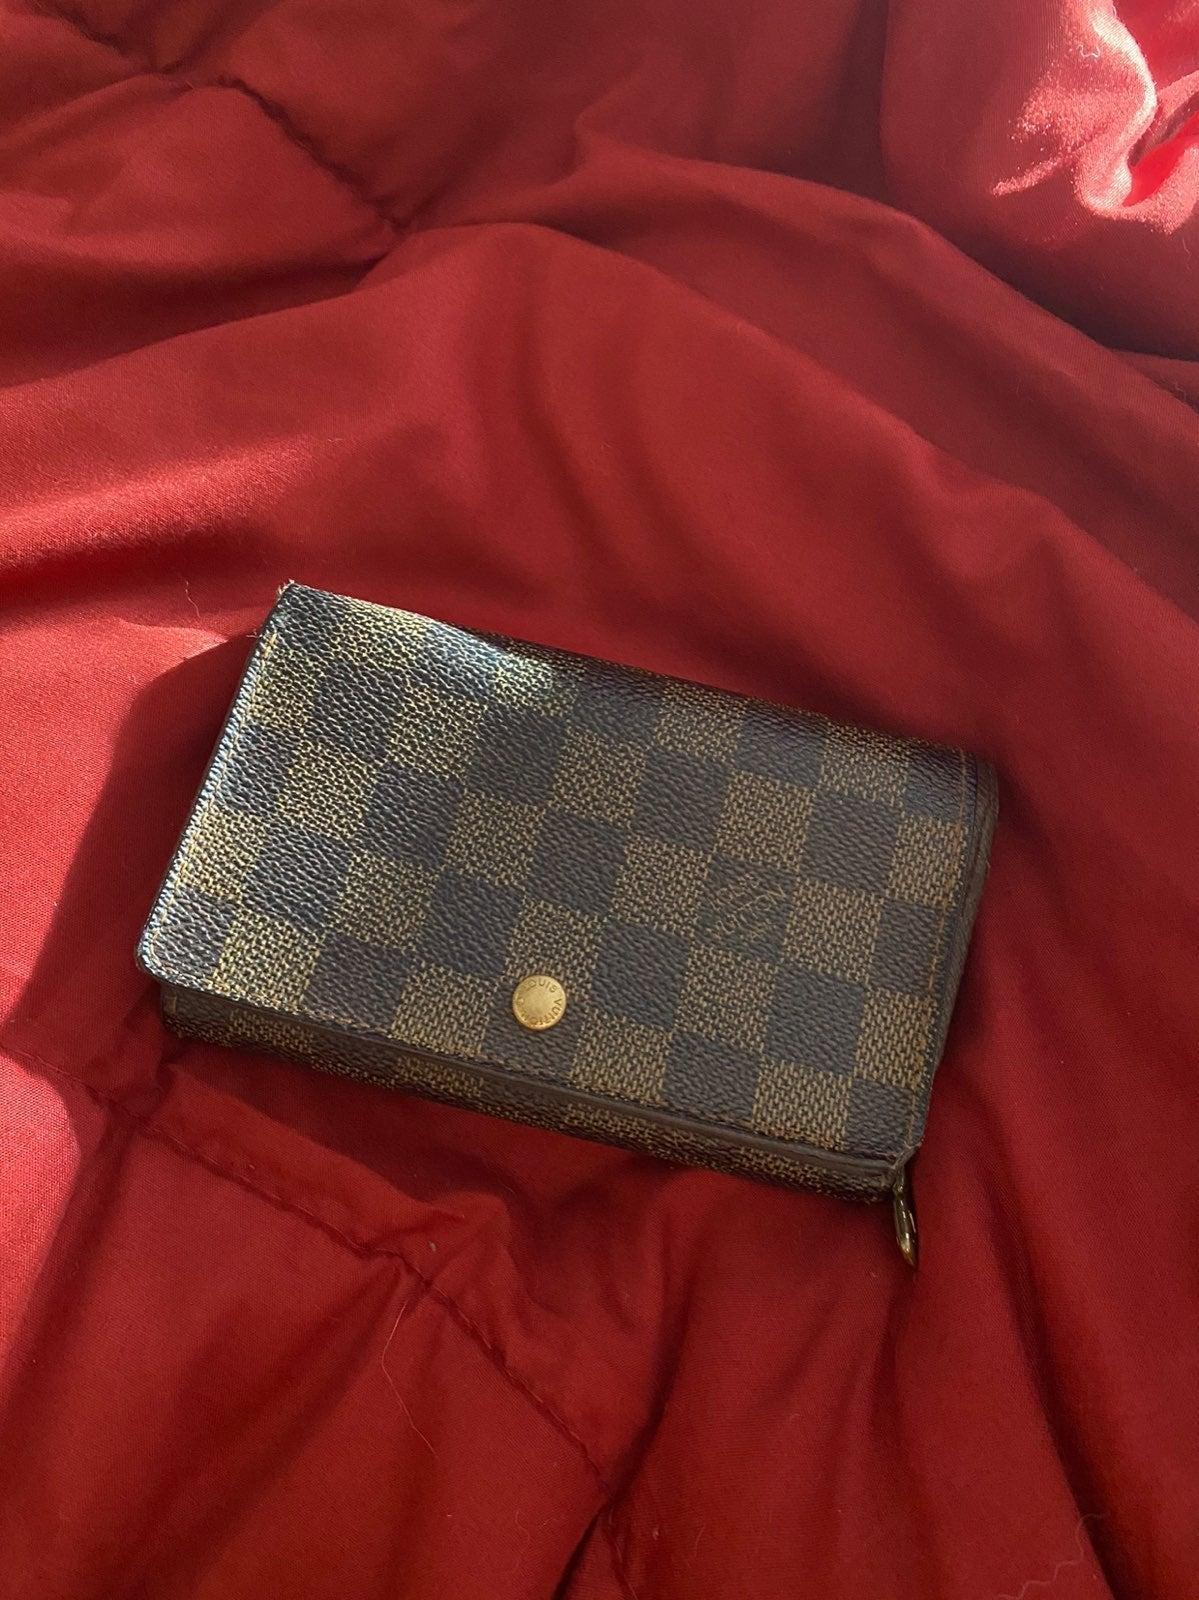 Louis Vuitton damier ebene tresor